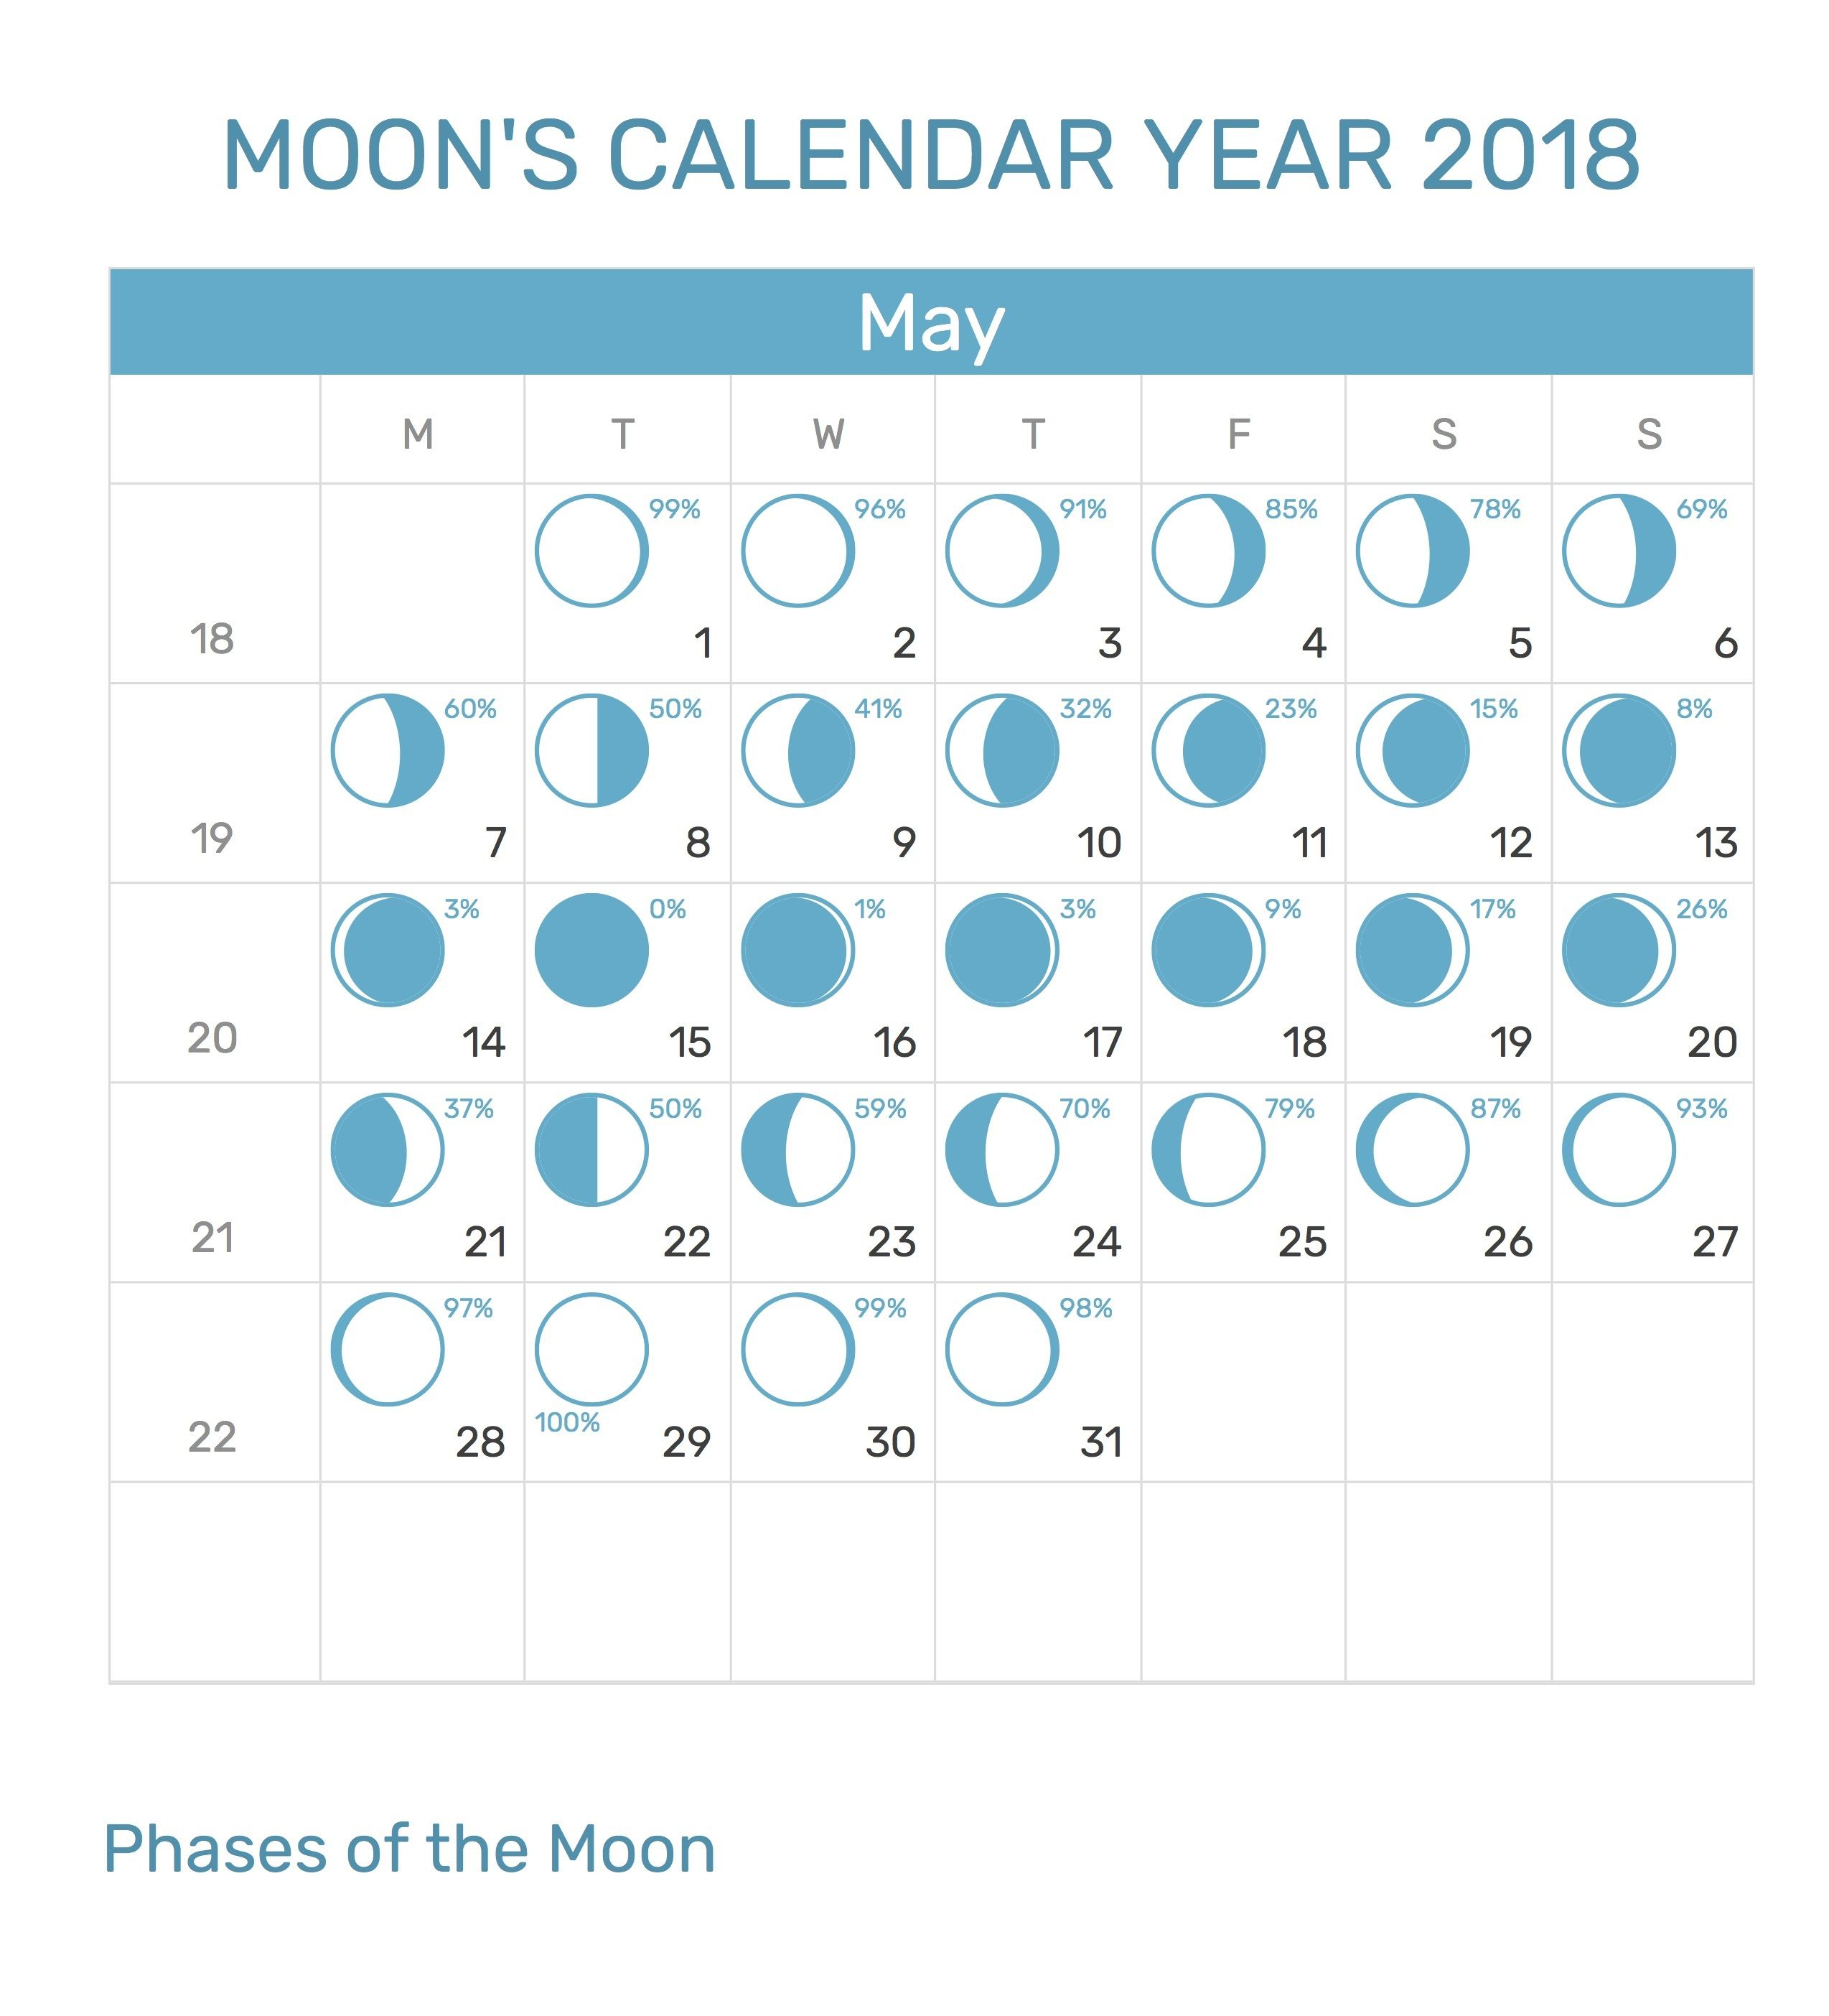 Http Zhonggdjw Com May 2018 Moon Printable Calendar Html May 2018 Moon Free Printable Calendar Educacion Preescolar Astrologia Educacion